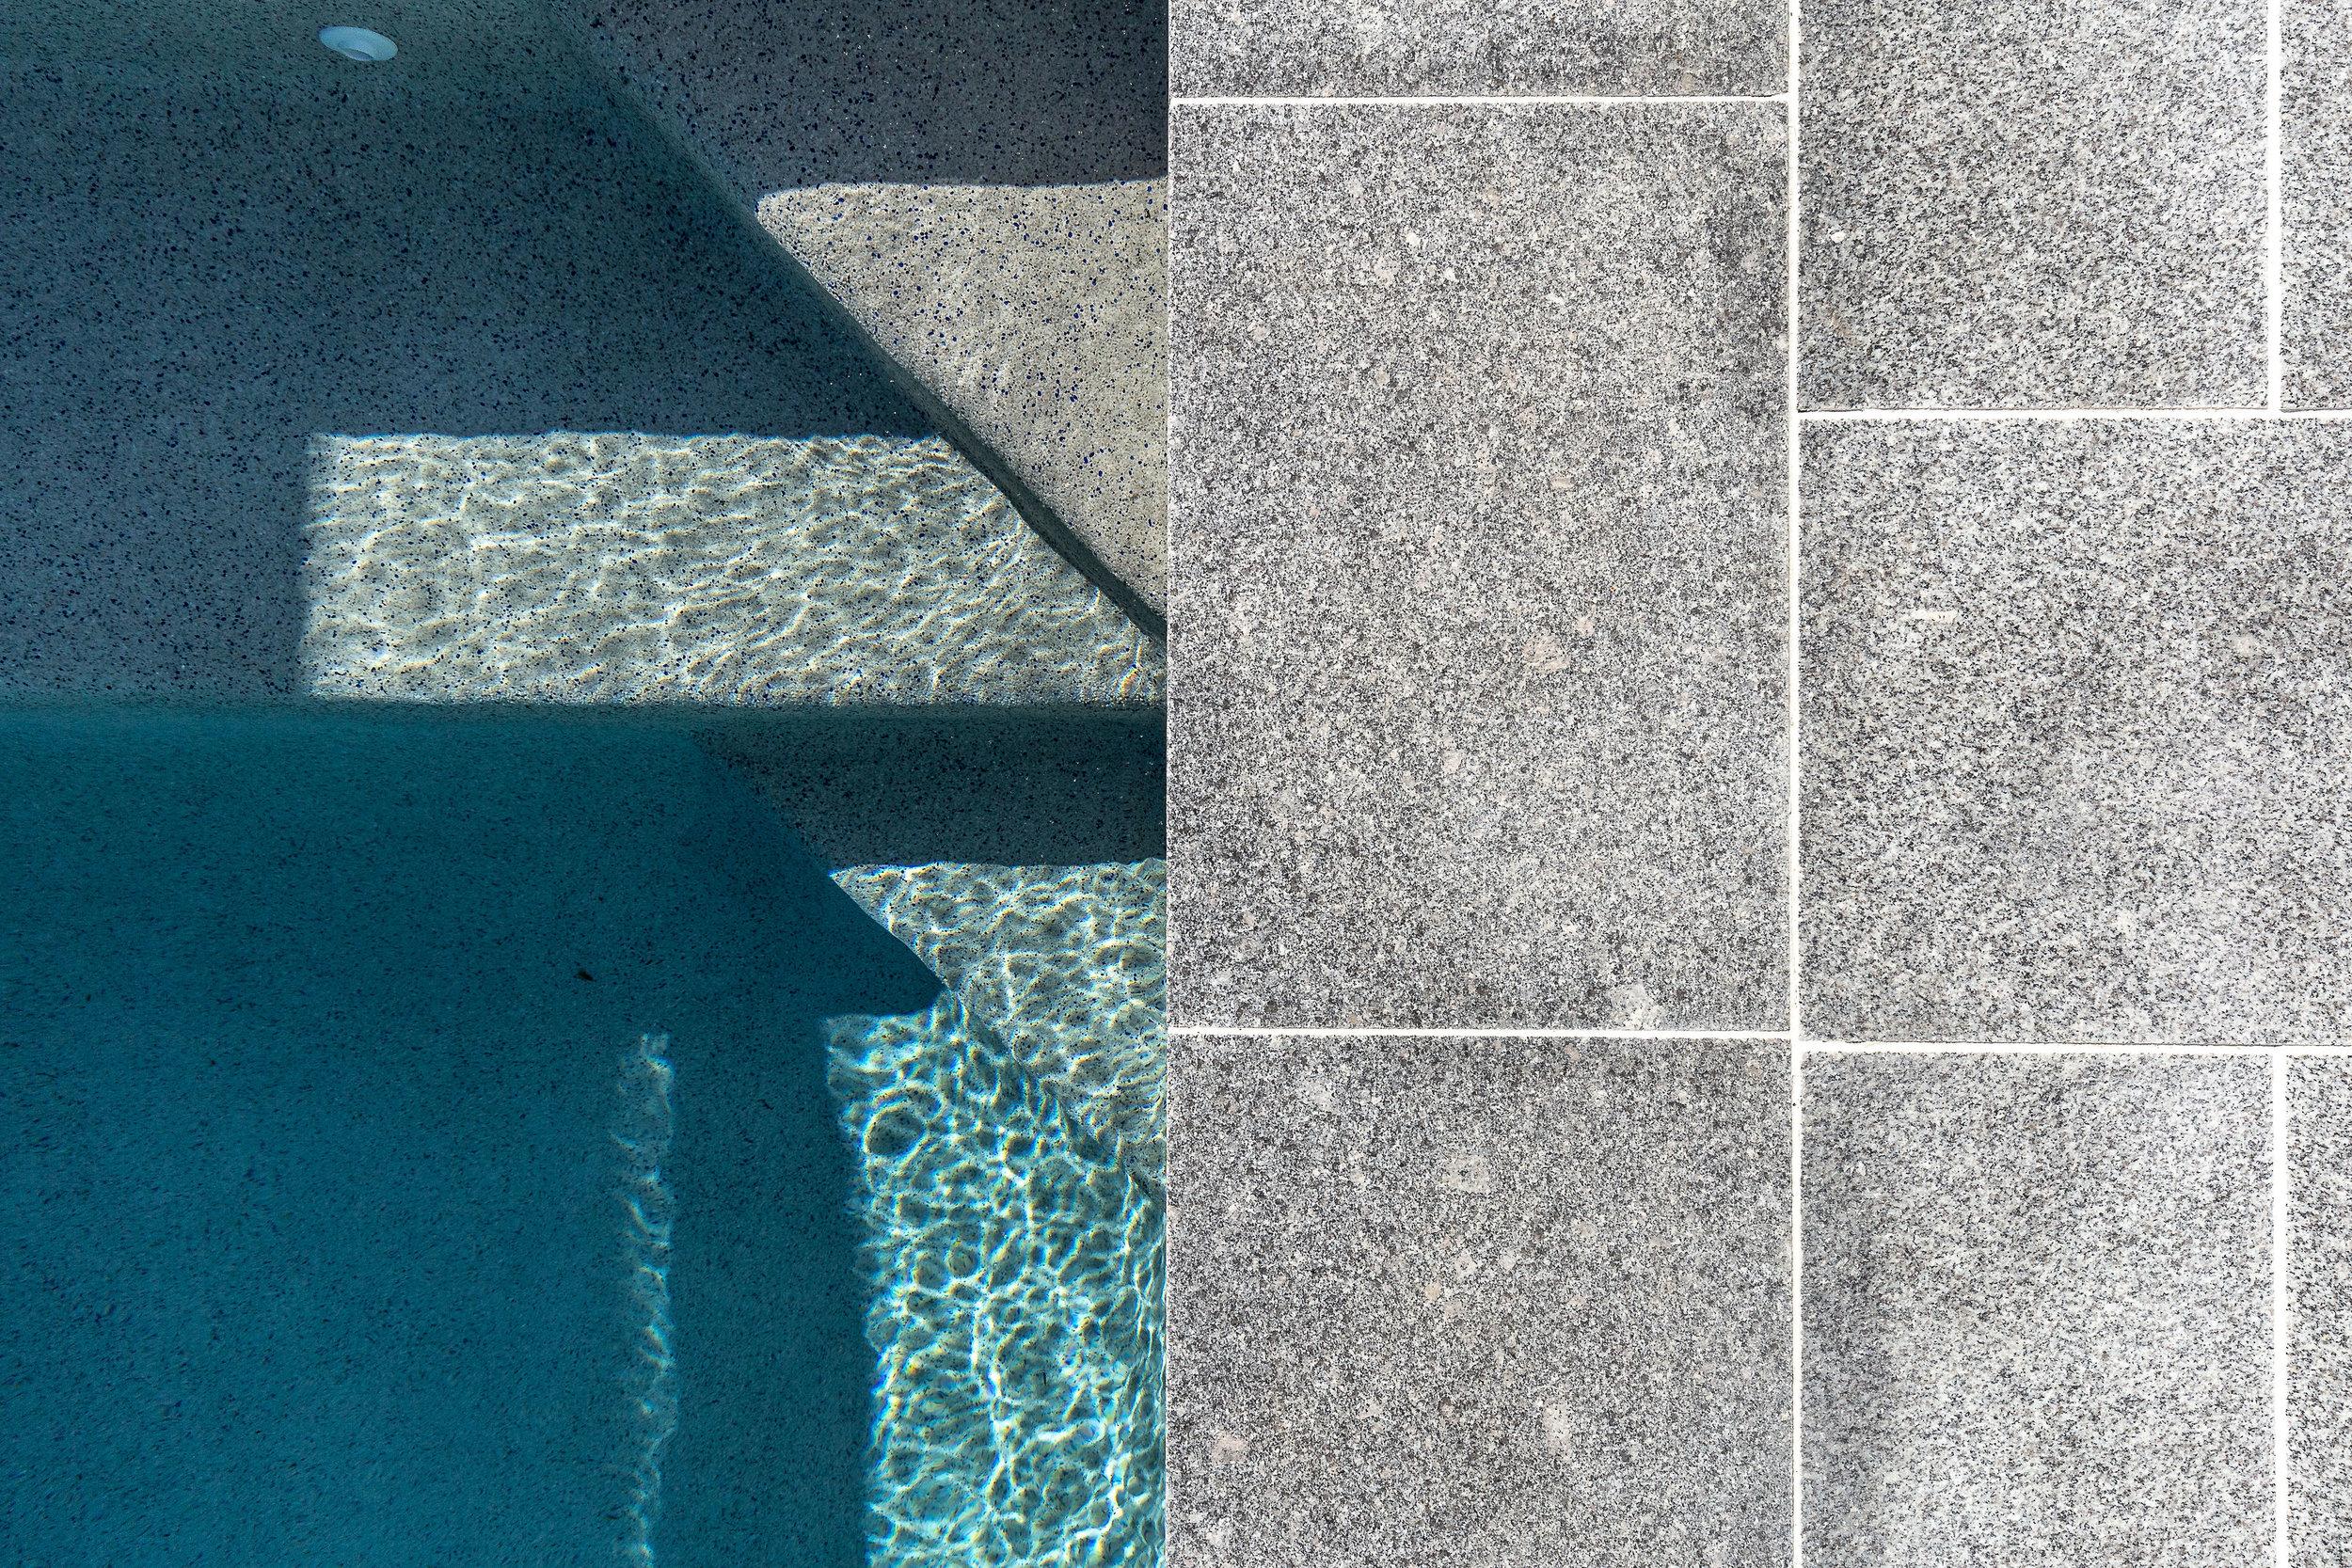 Poolside: Salt & Pepper Granite flooring